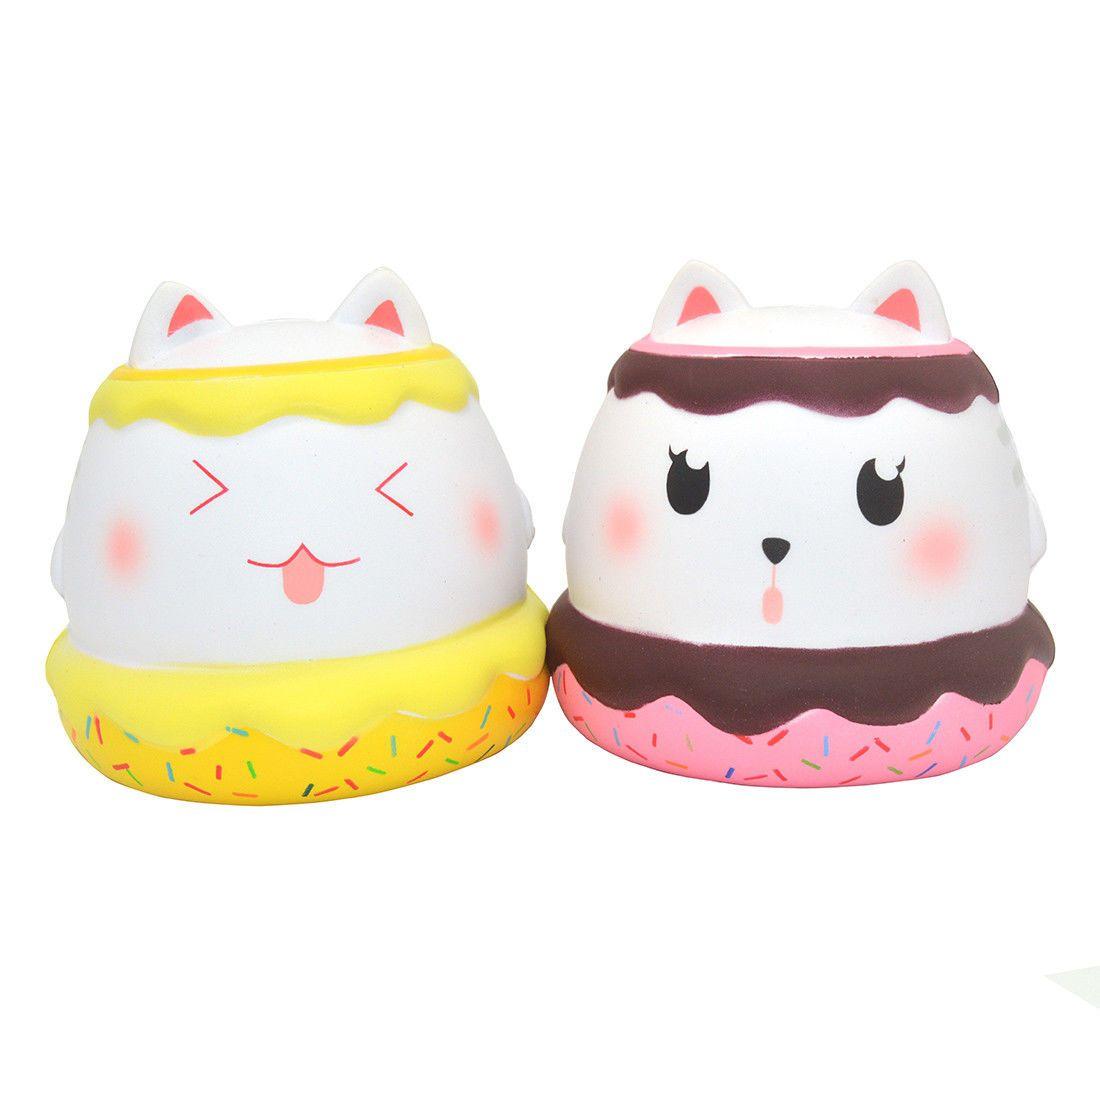 Japan squishy Zipper squishy Scented squishy Japan Puff Squishy Wrist rest squishy Bag charm squishy Squishy toy